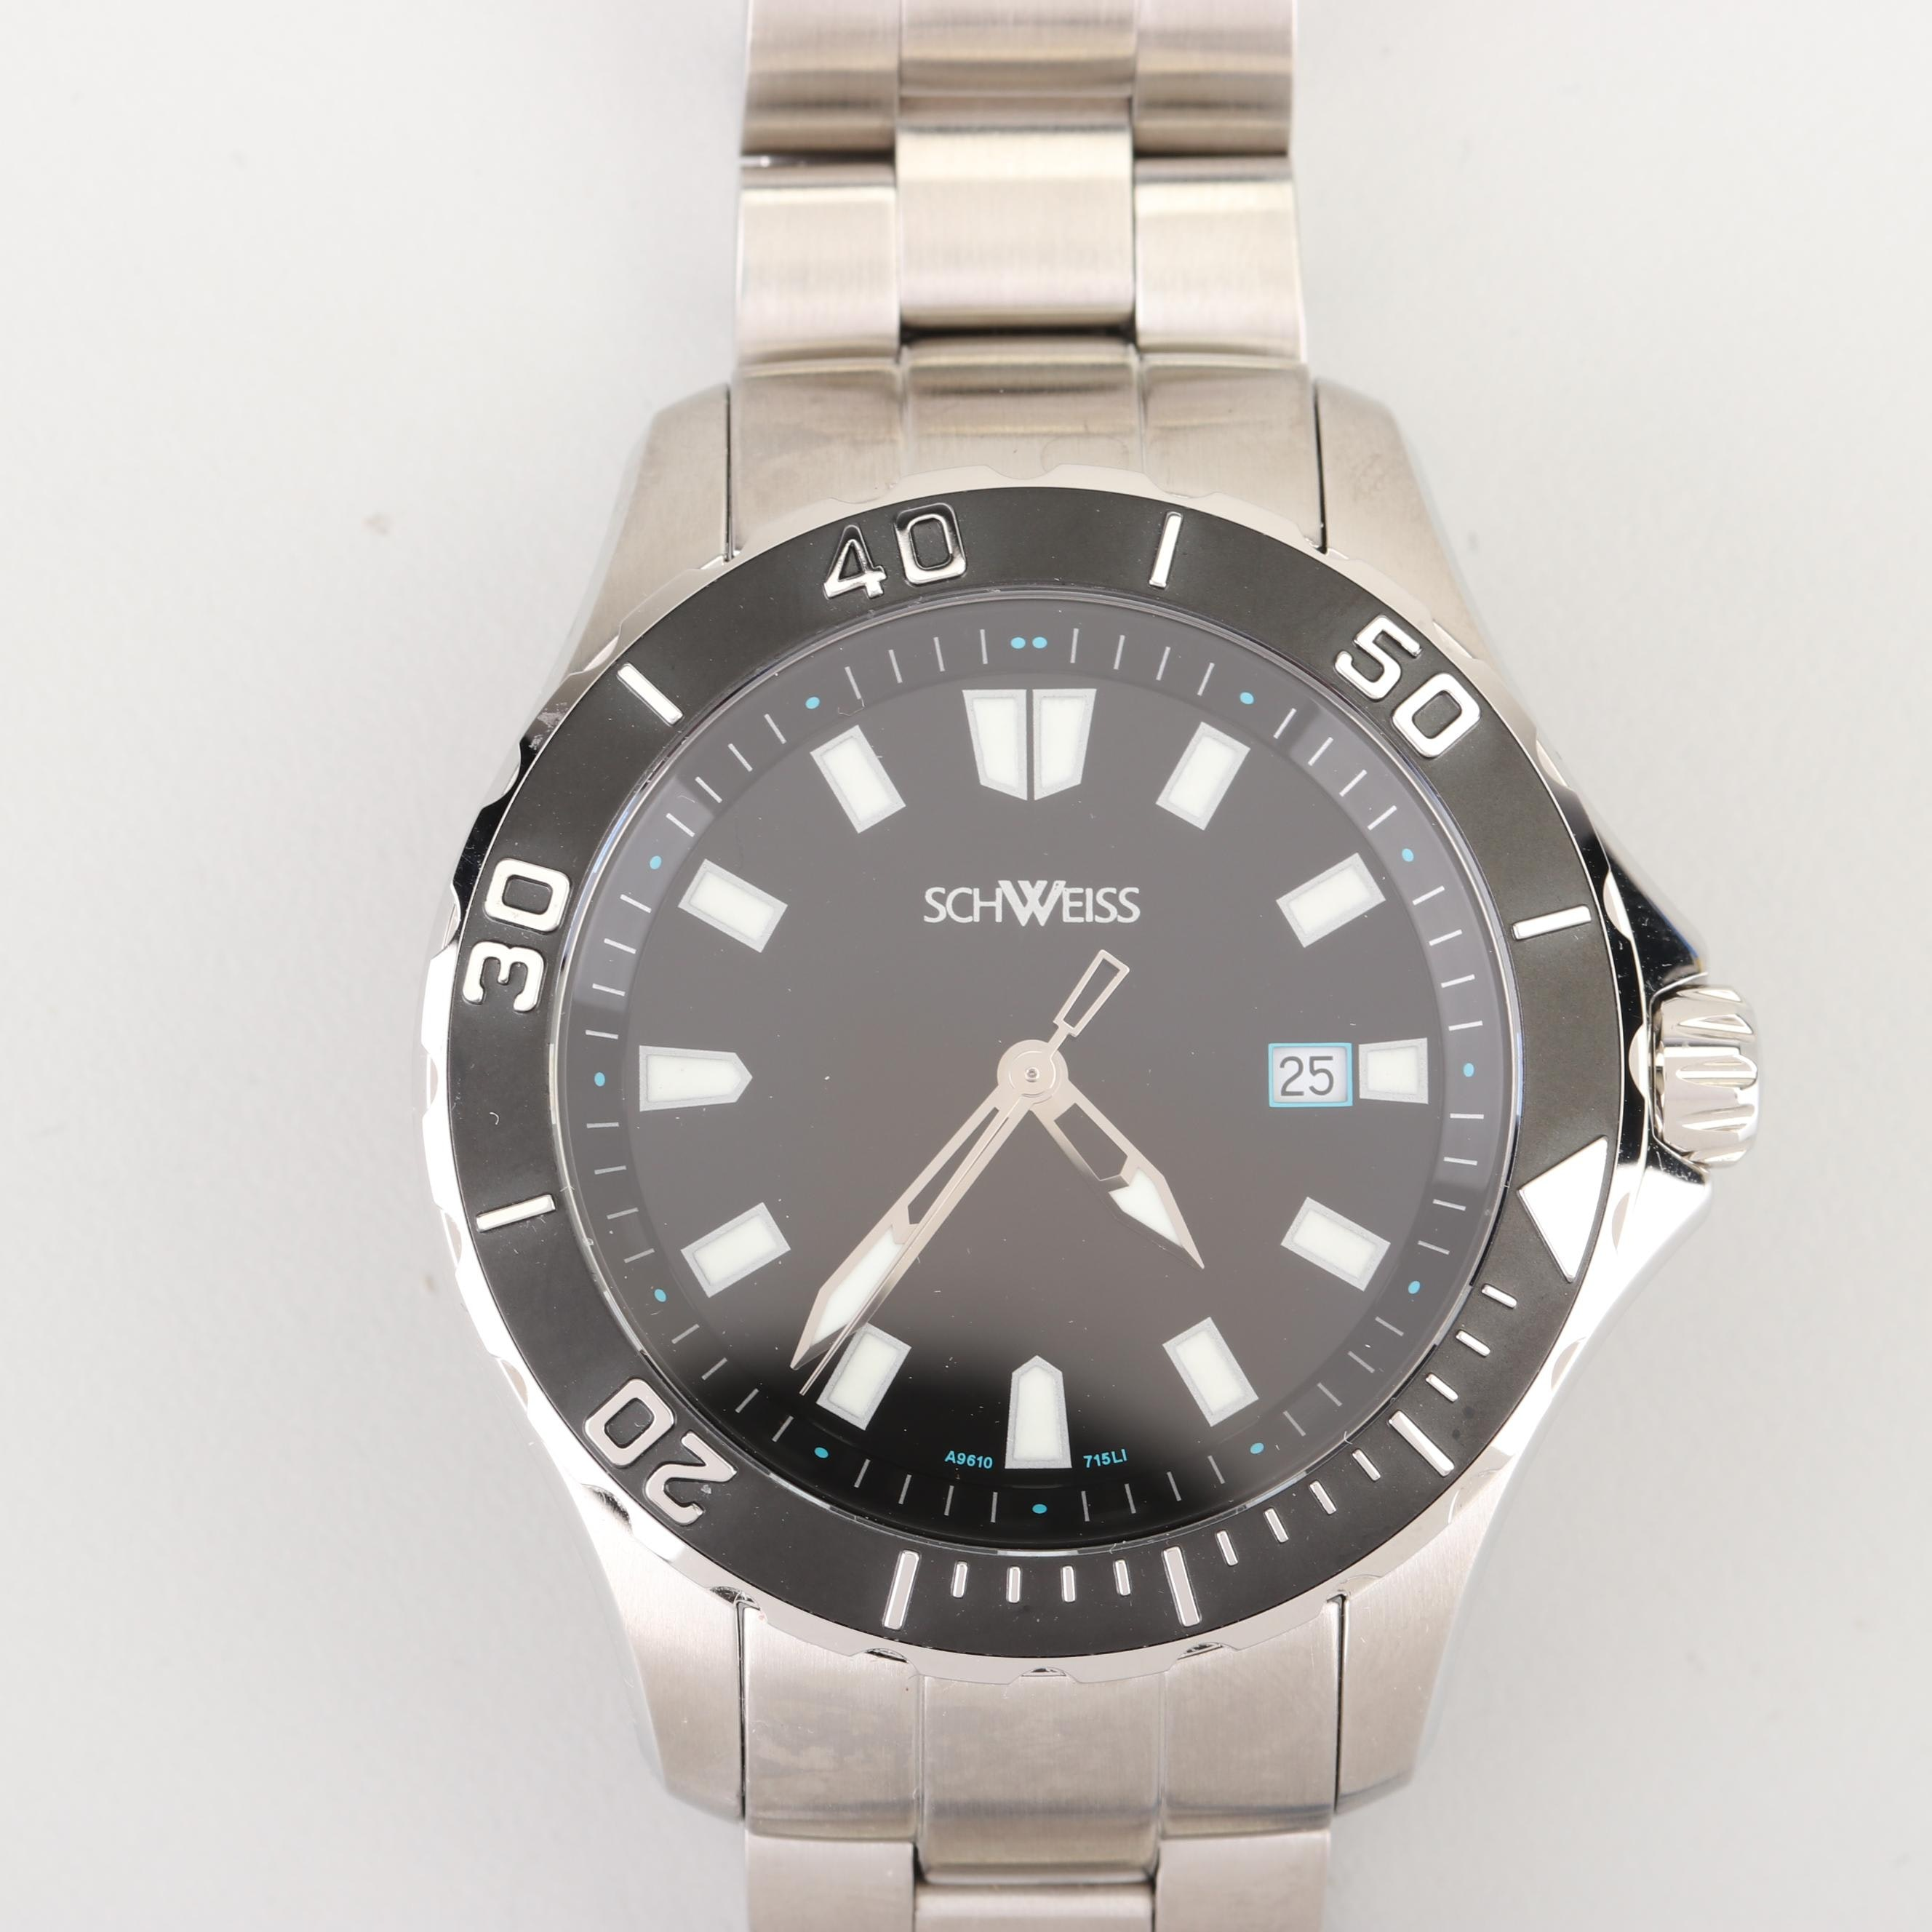 Schweiss Swiss Ceramic and Stainless Steel Wristwatch